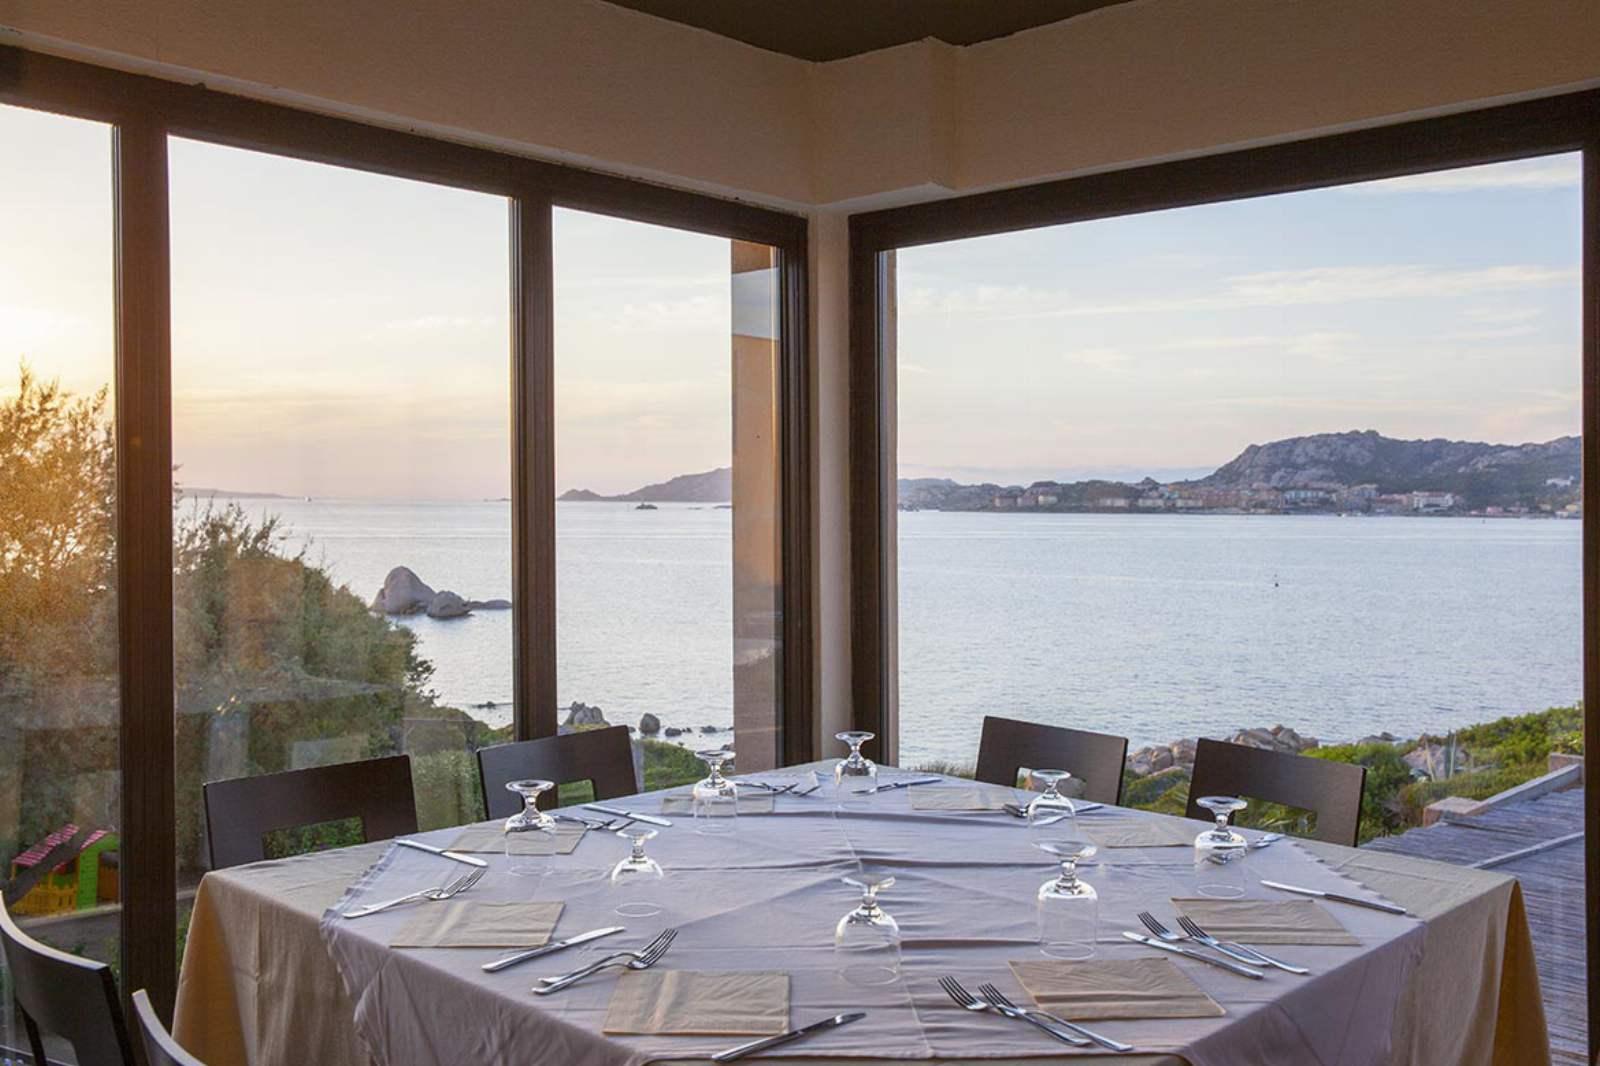 Santo Stefano Resort: room / property / locale photo. Image 9